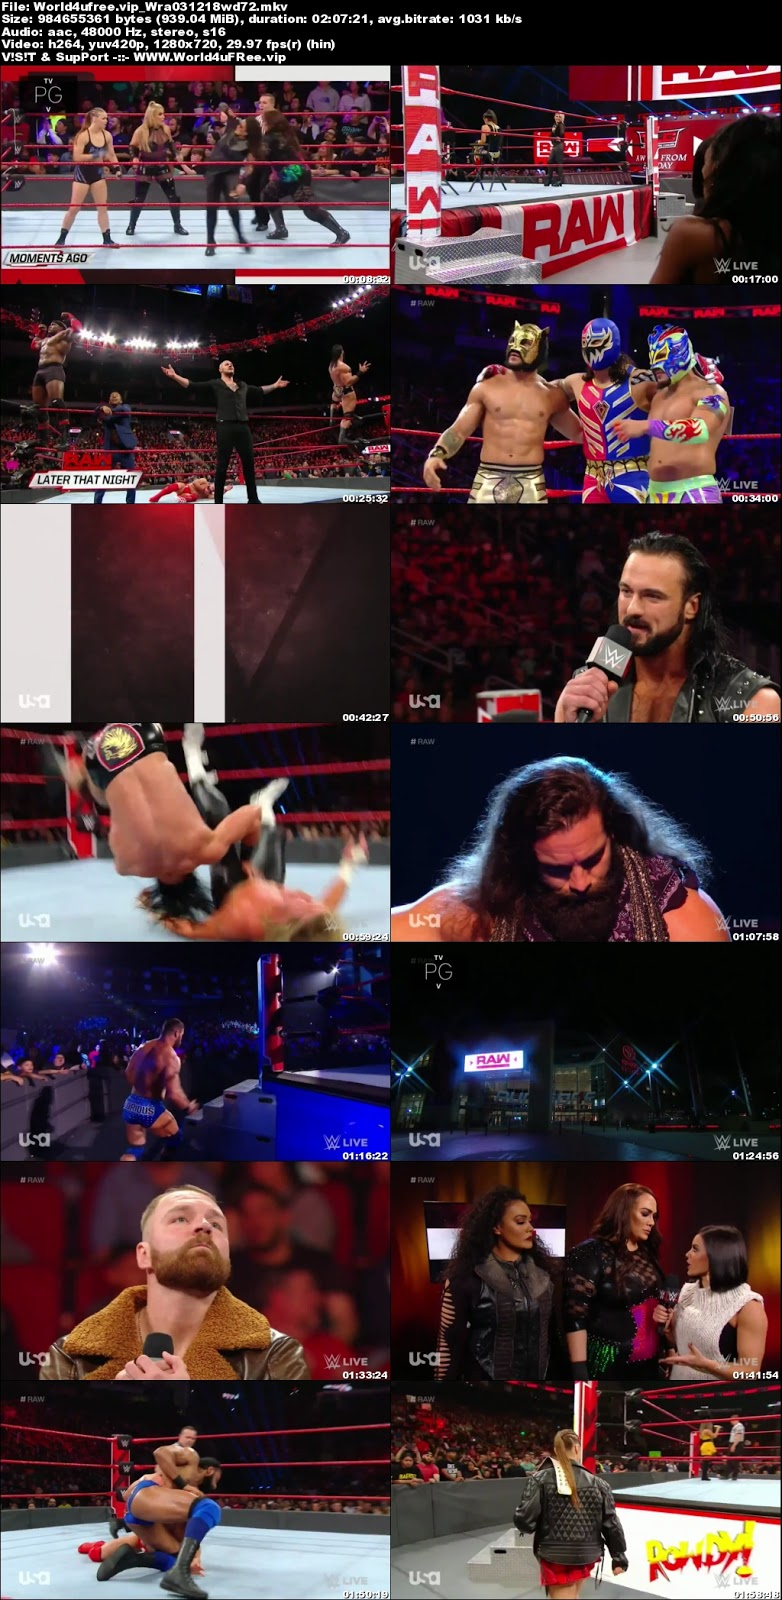 WWE Monday Night RAW 03 DECEMBER 2018 720p HDTV 1Gb x264world4ufree.fun tv show wwe monday night raw wwe show monday night raw compressed small size free download or watch onlne at world4ufree.fun